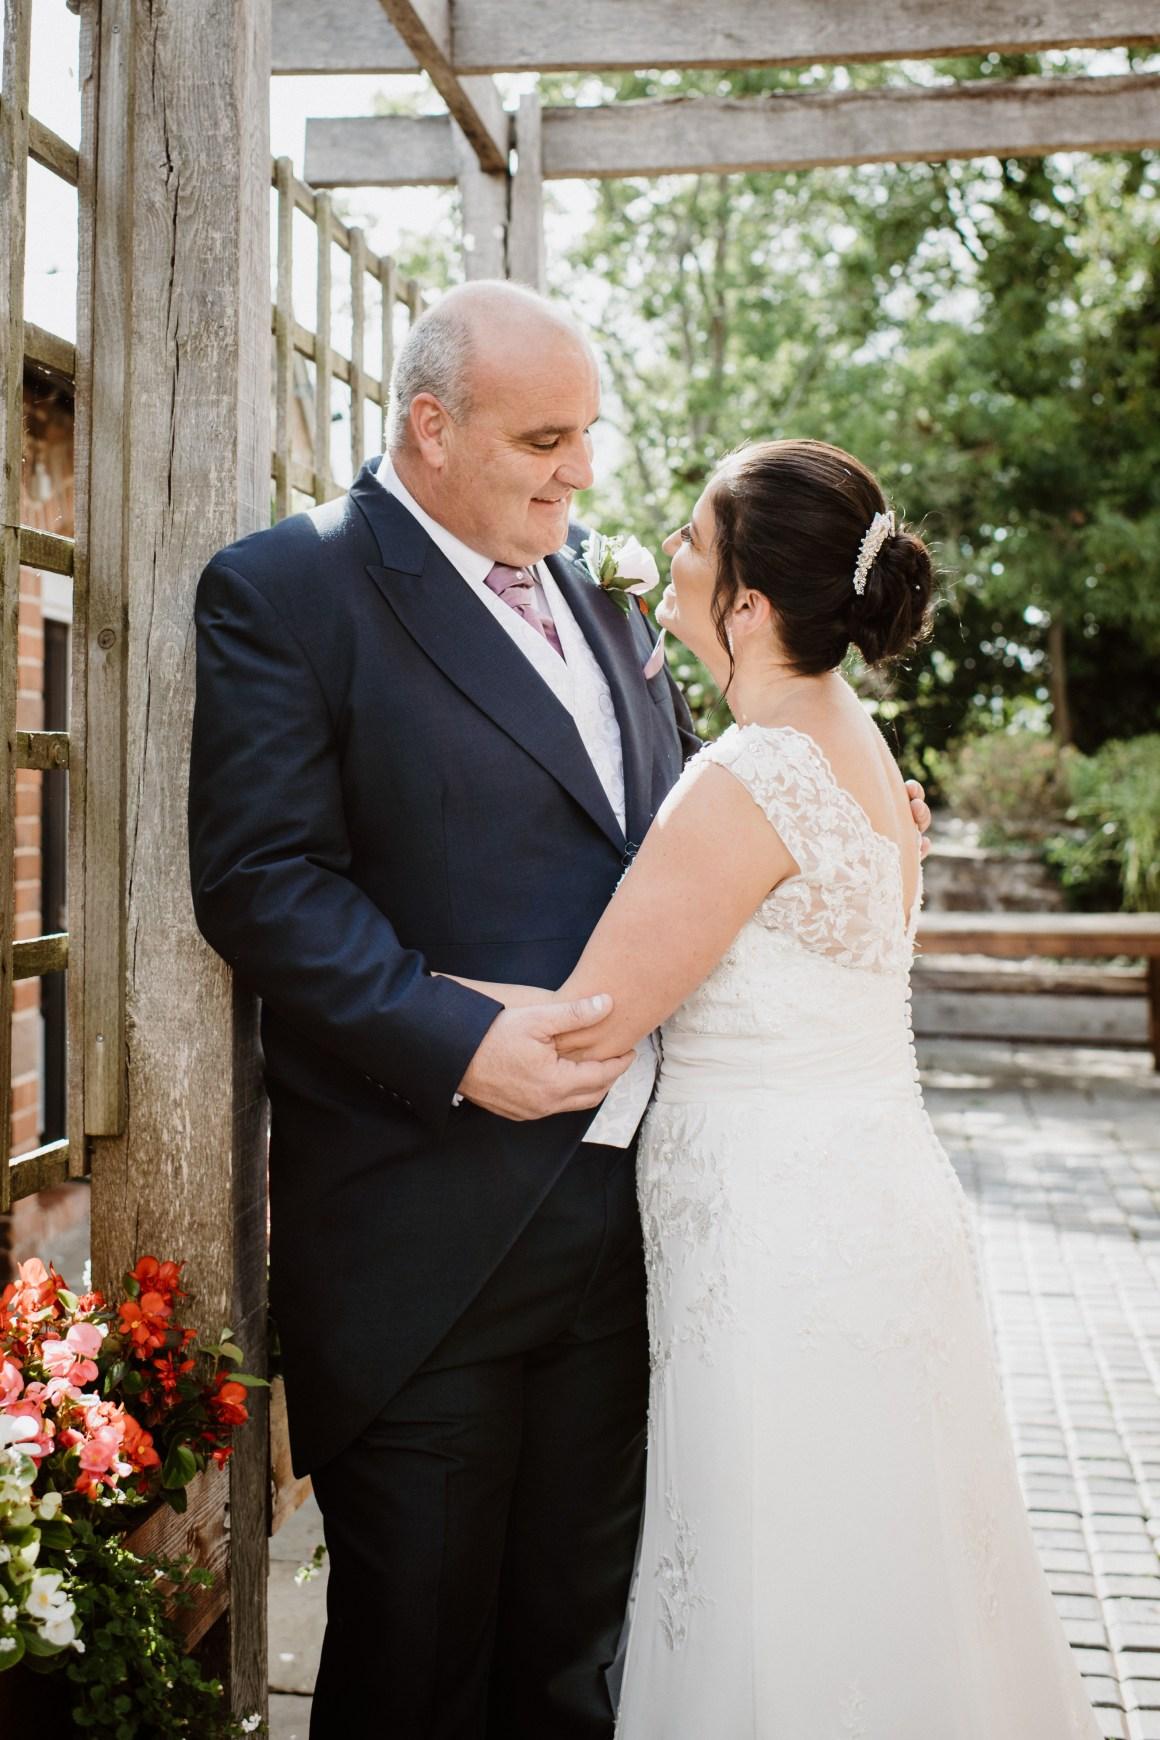 Paula & Martin's Wedding